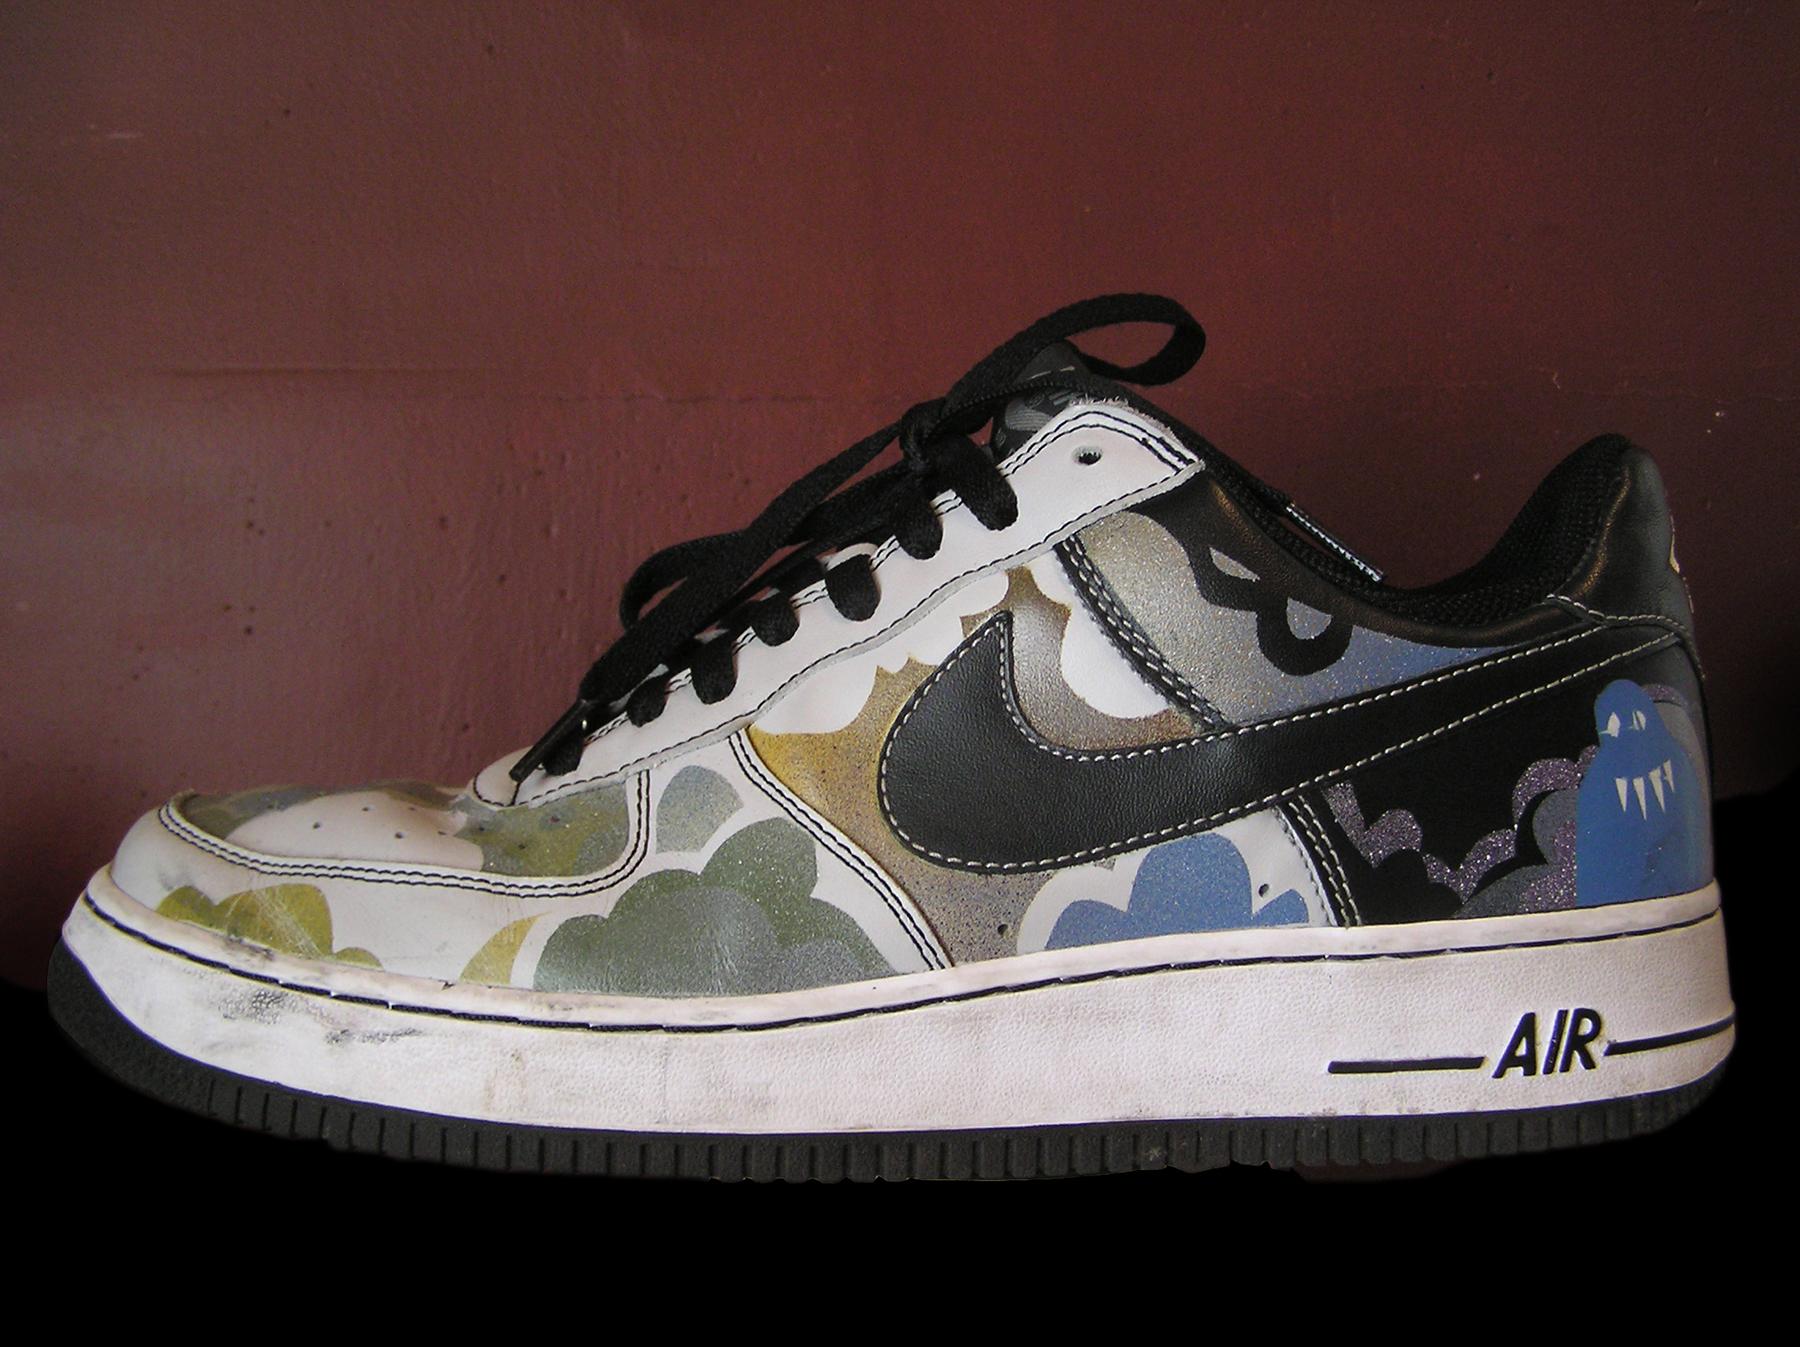 Shoes in August_07b (3).jpg